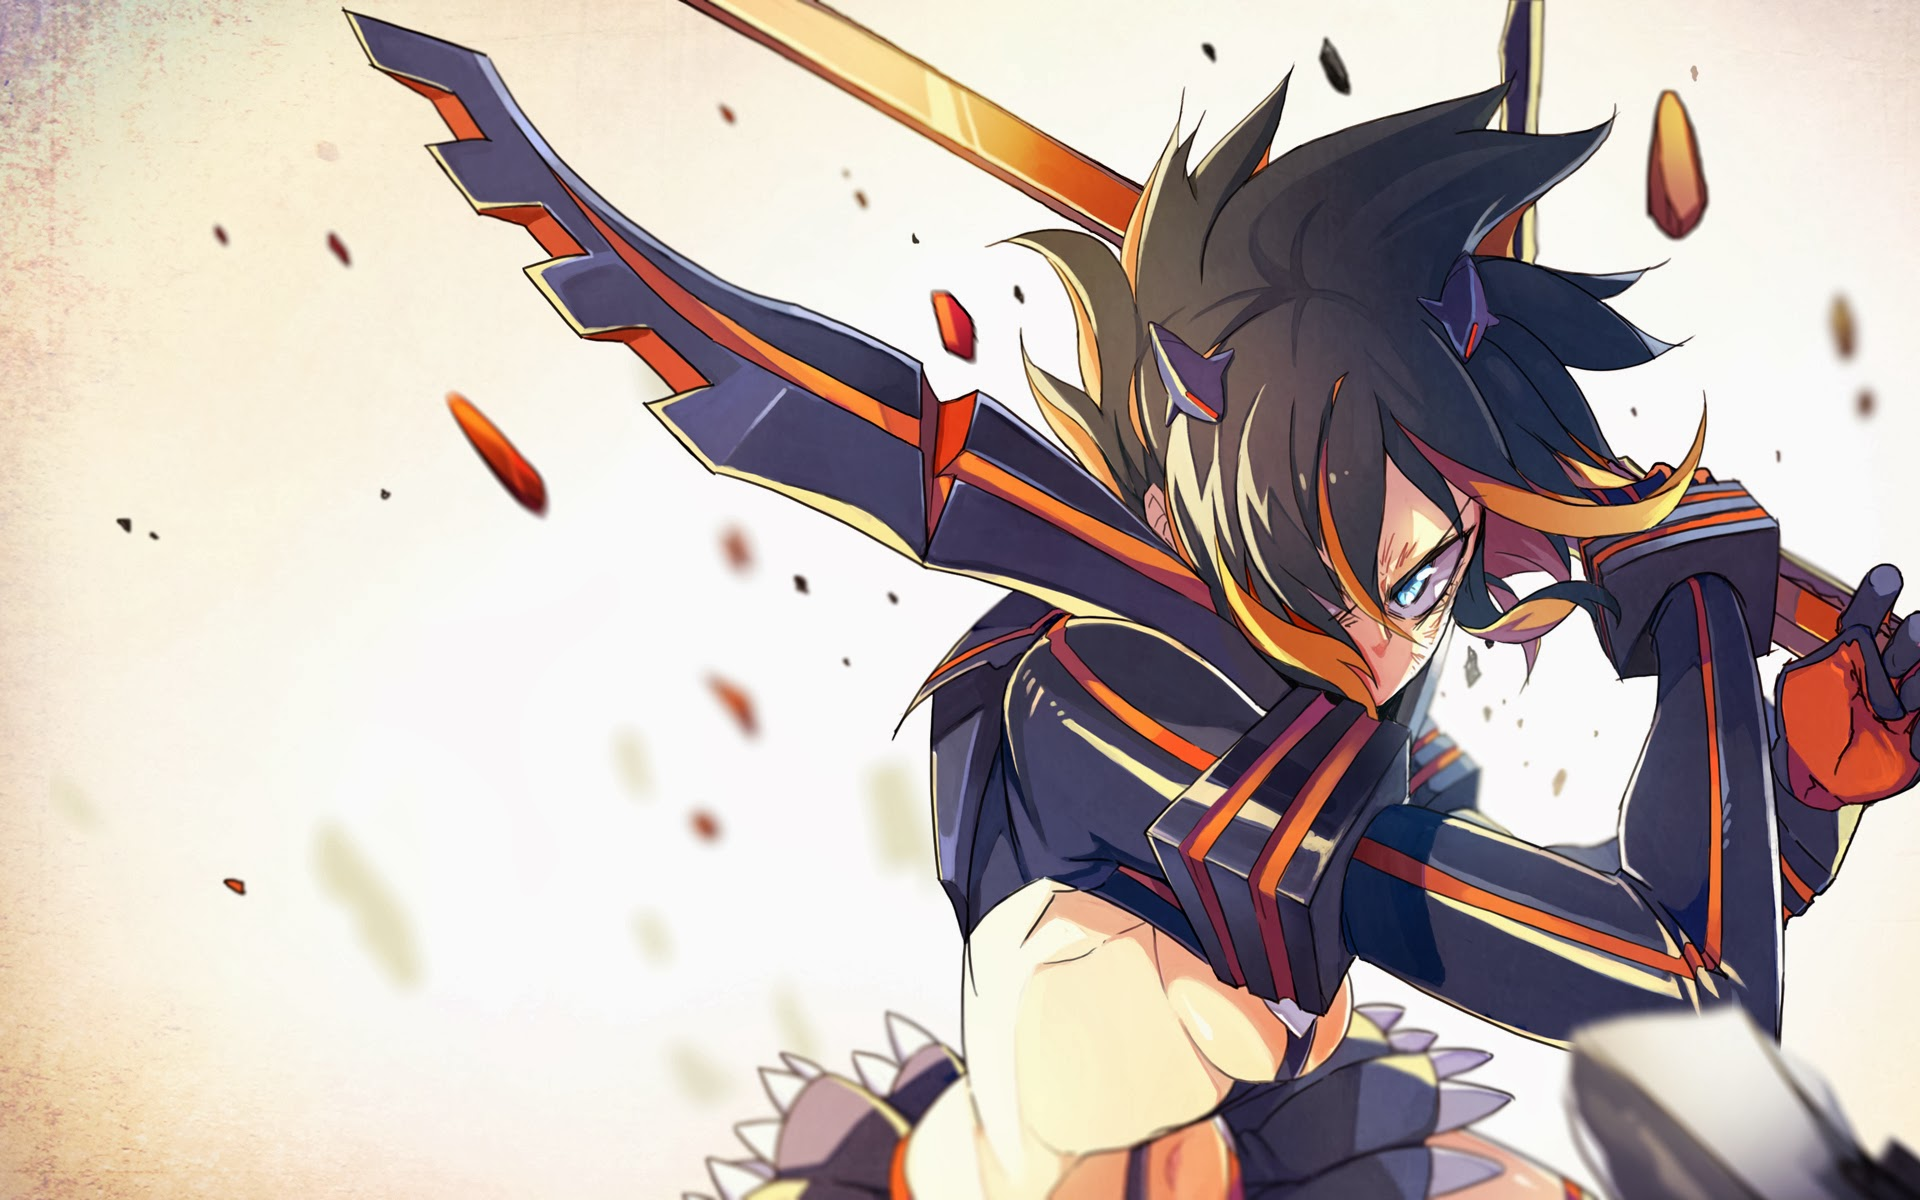 matoi ryuko kill la kill anime girl image hd wallpaper 1920x1080 40 1920x1200